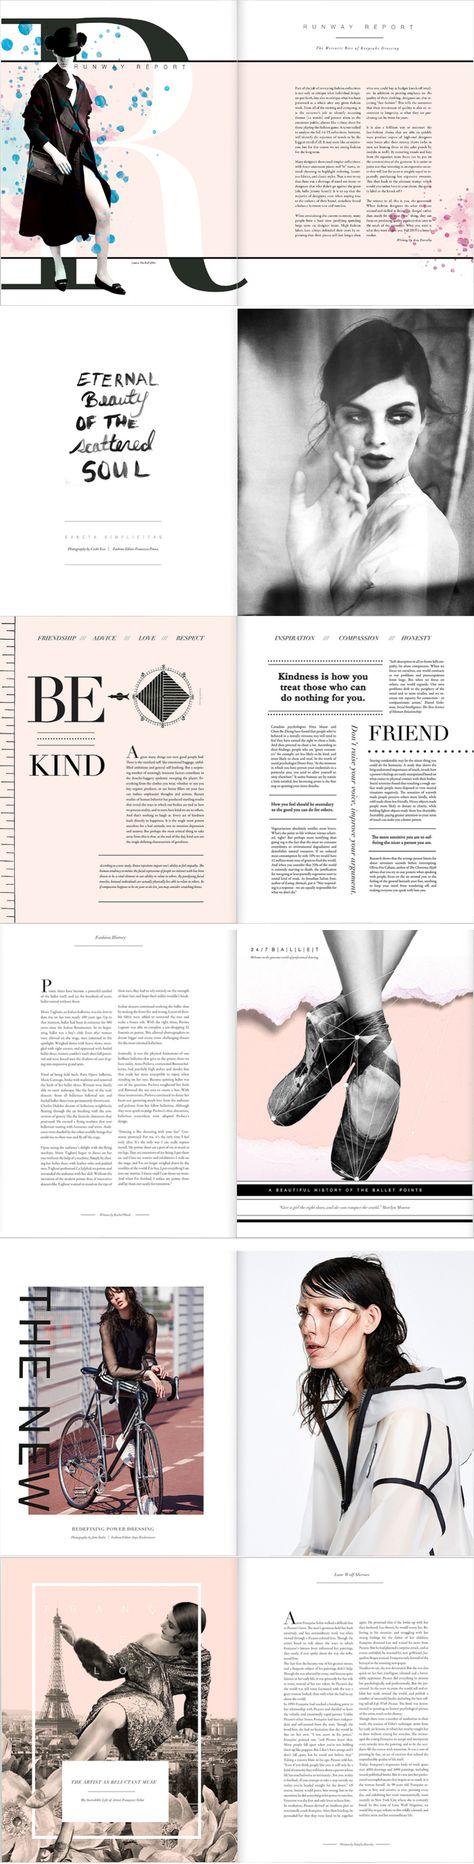 Lone Wolf Magazine | Issue 10 Layout